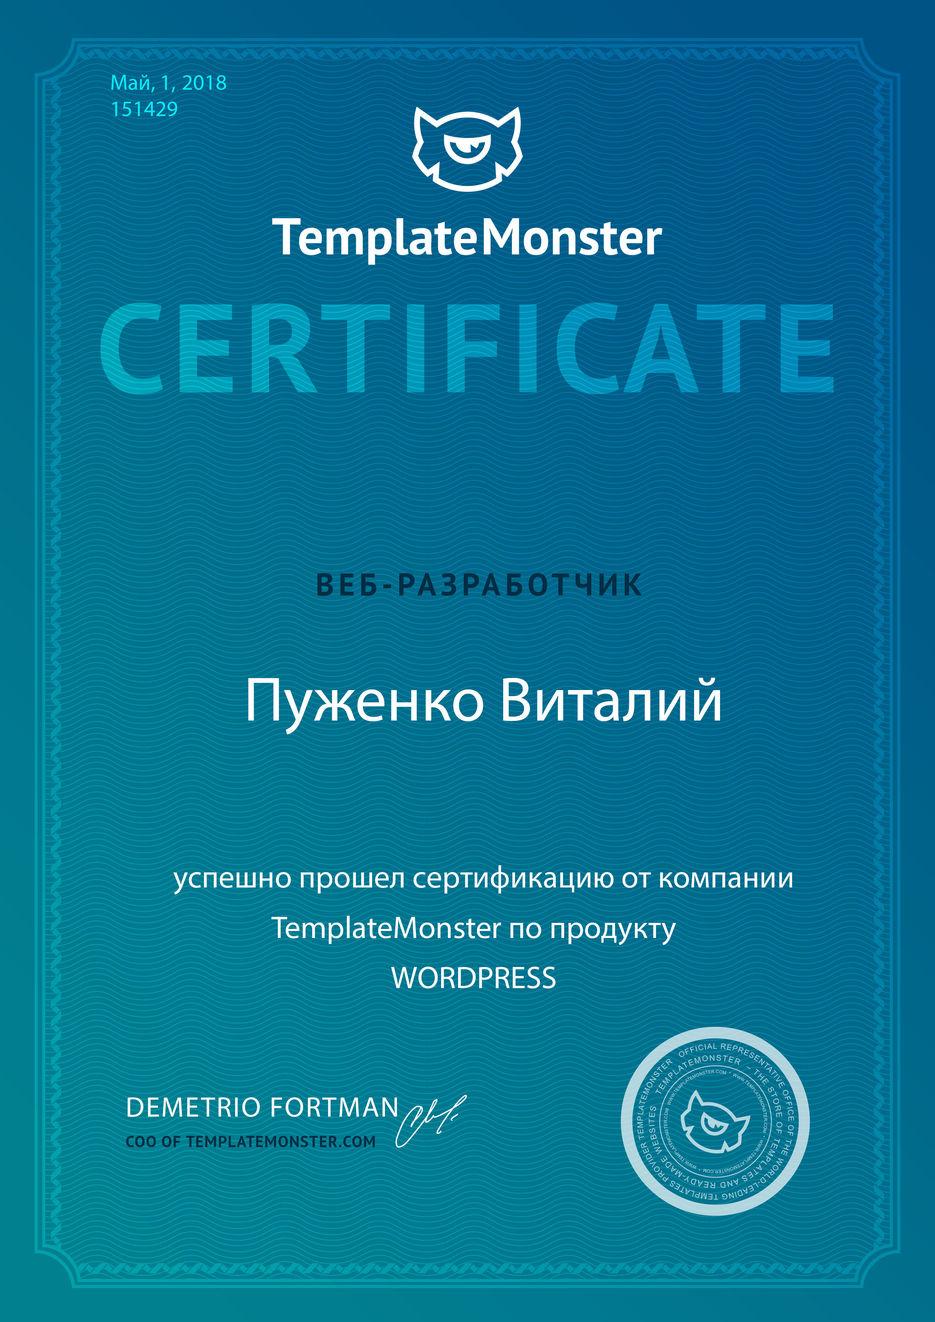 Сертификат Веб-разработчика по CMS WordPress